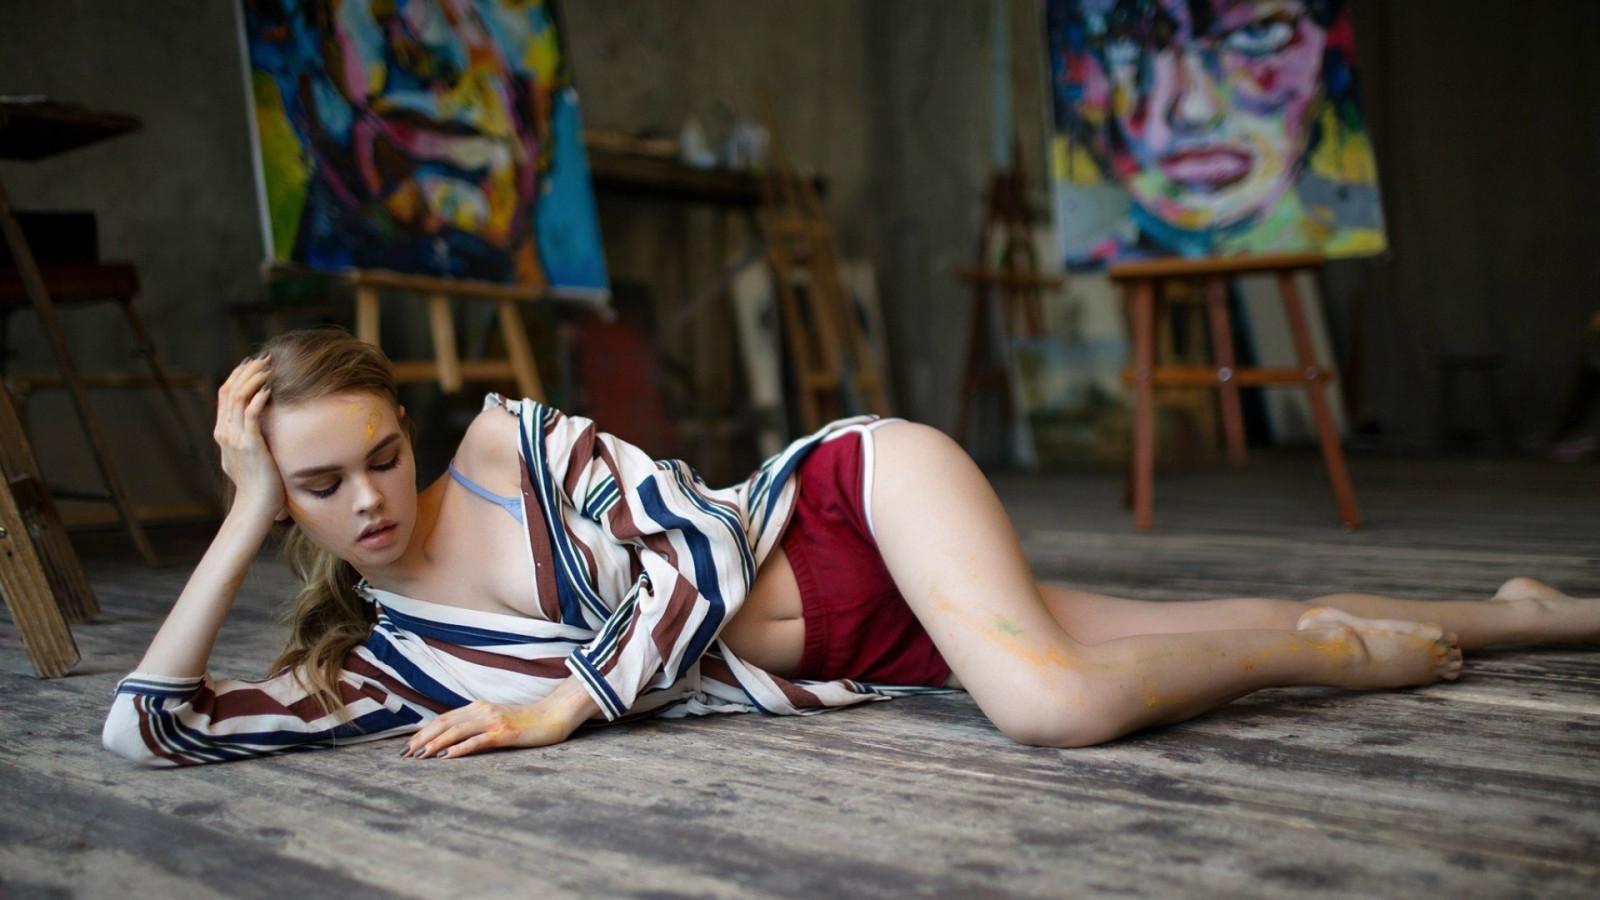 women, model, legs, sitting, Anastasia Scheglova, on the floor, fashion, Person, color, child, girl, beauty, human positions, photo shoot, performance art